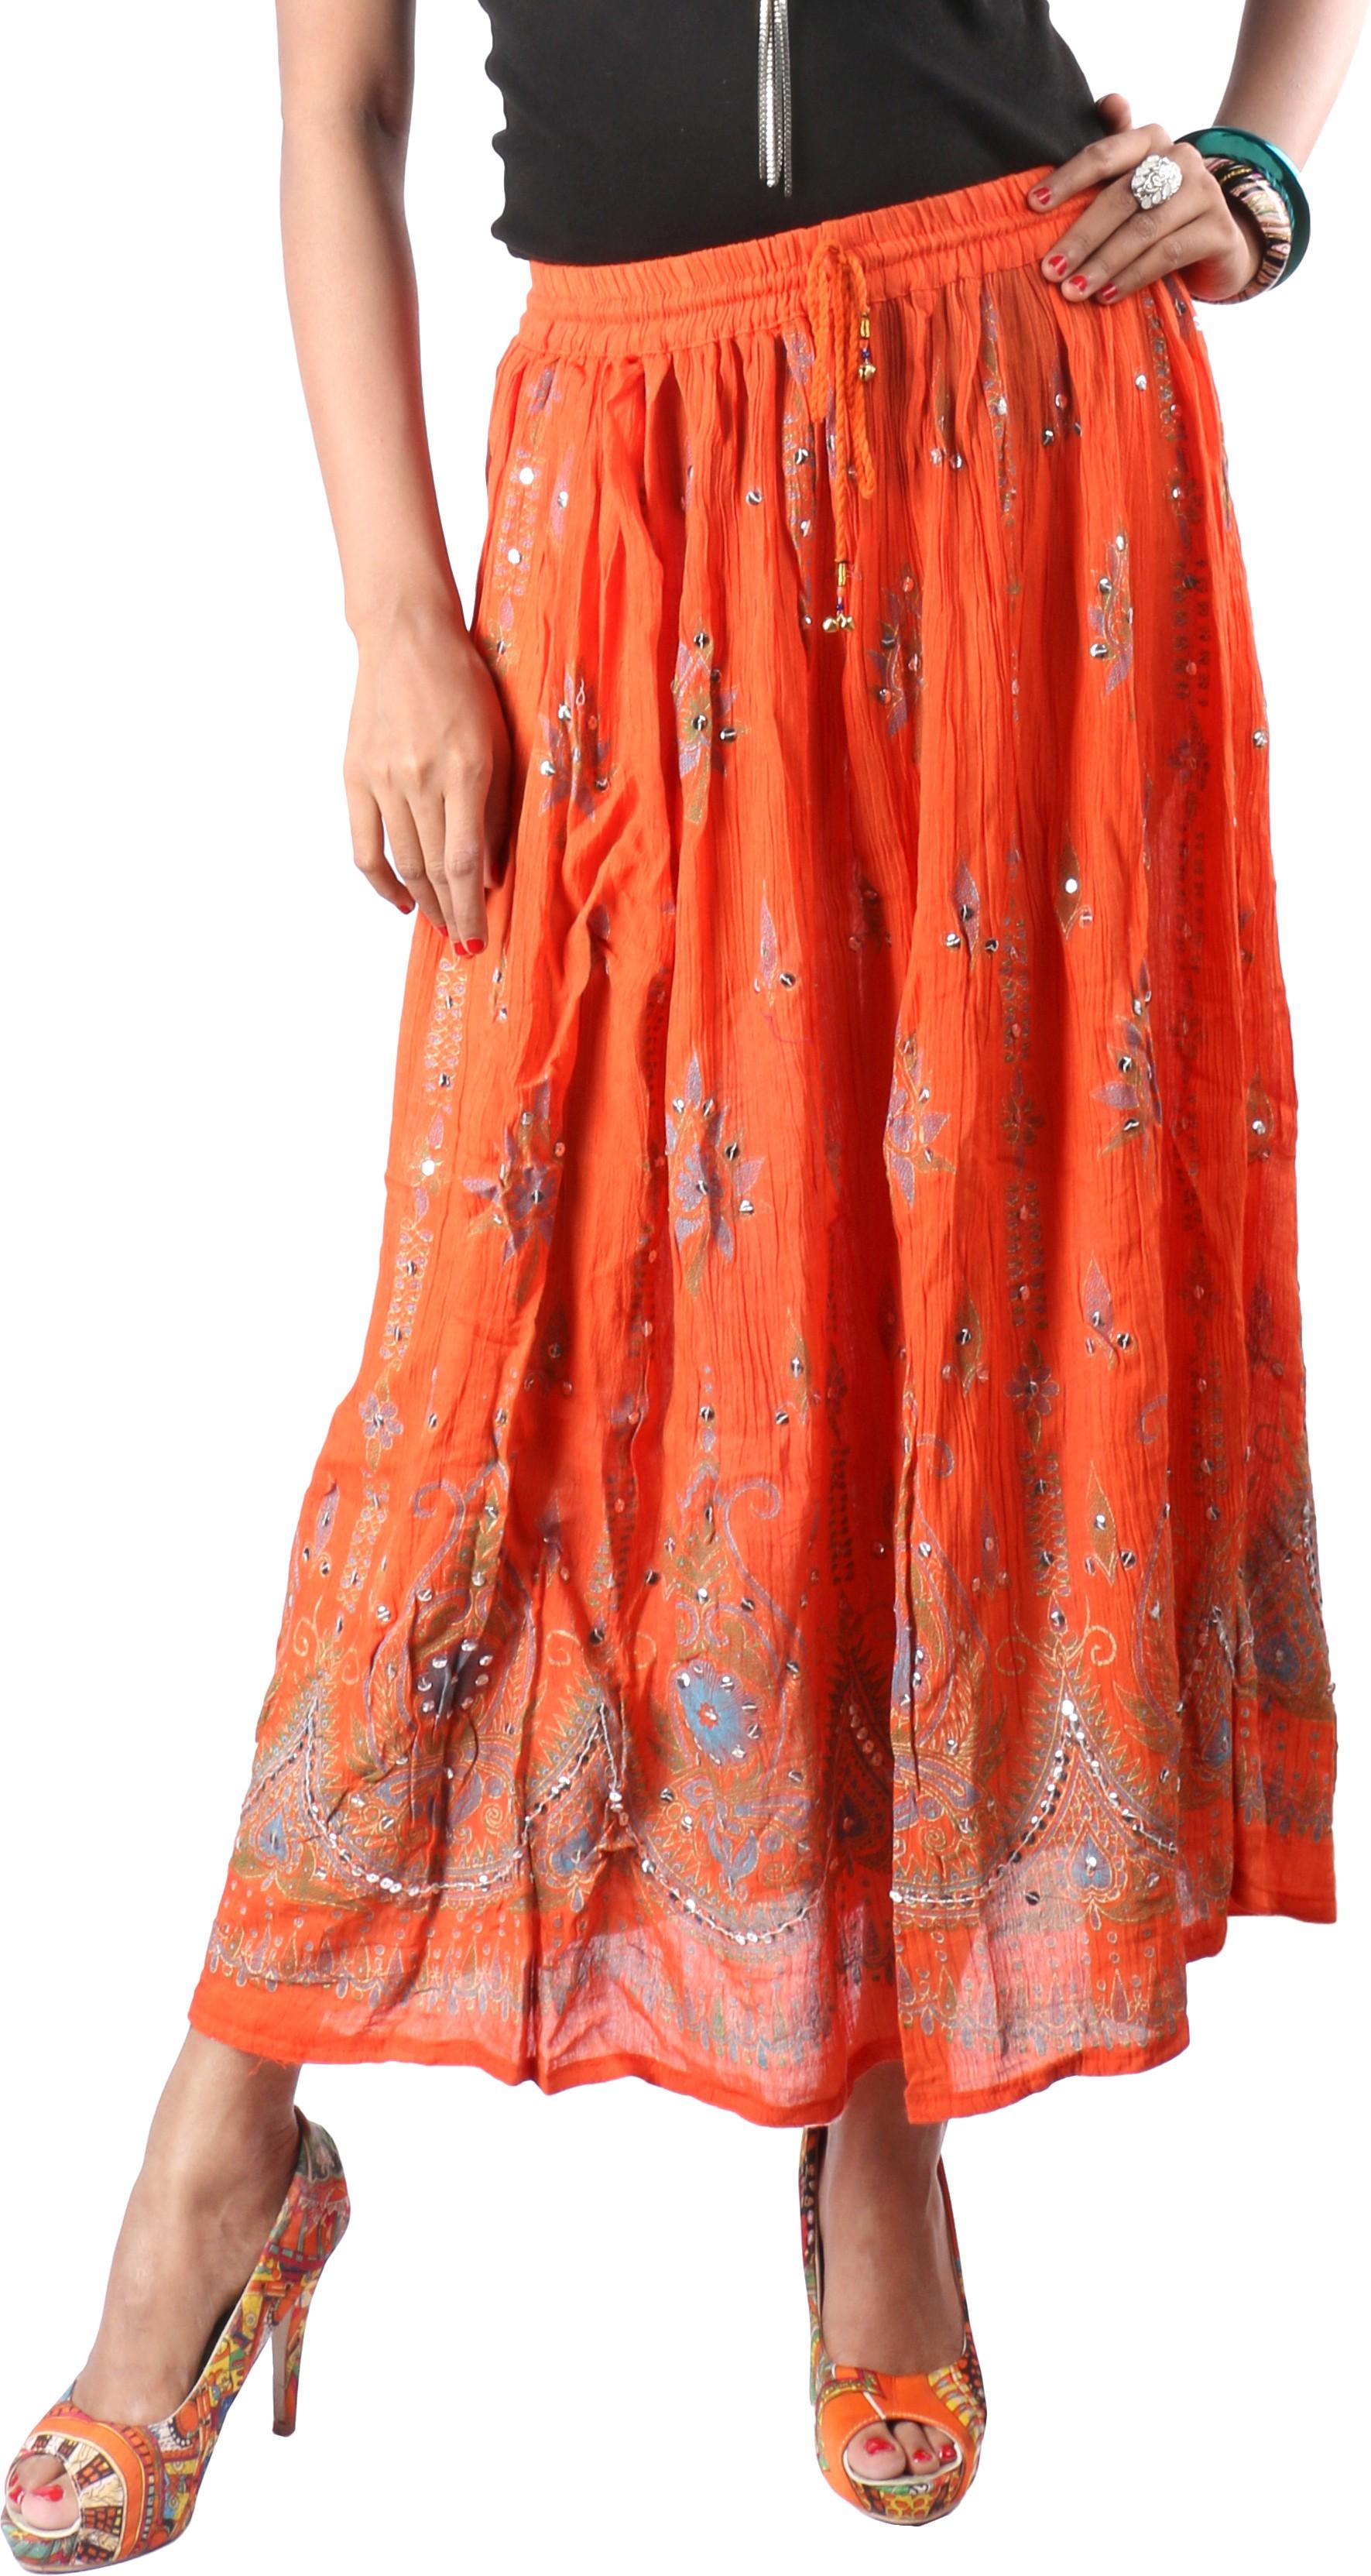 Indiankala4u Printed Womens Broomstick Orange Skirt